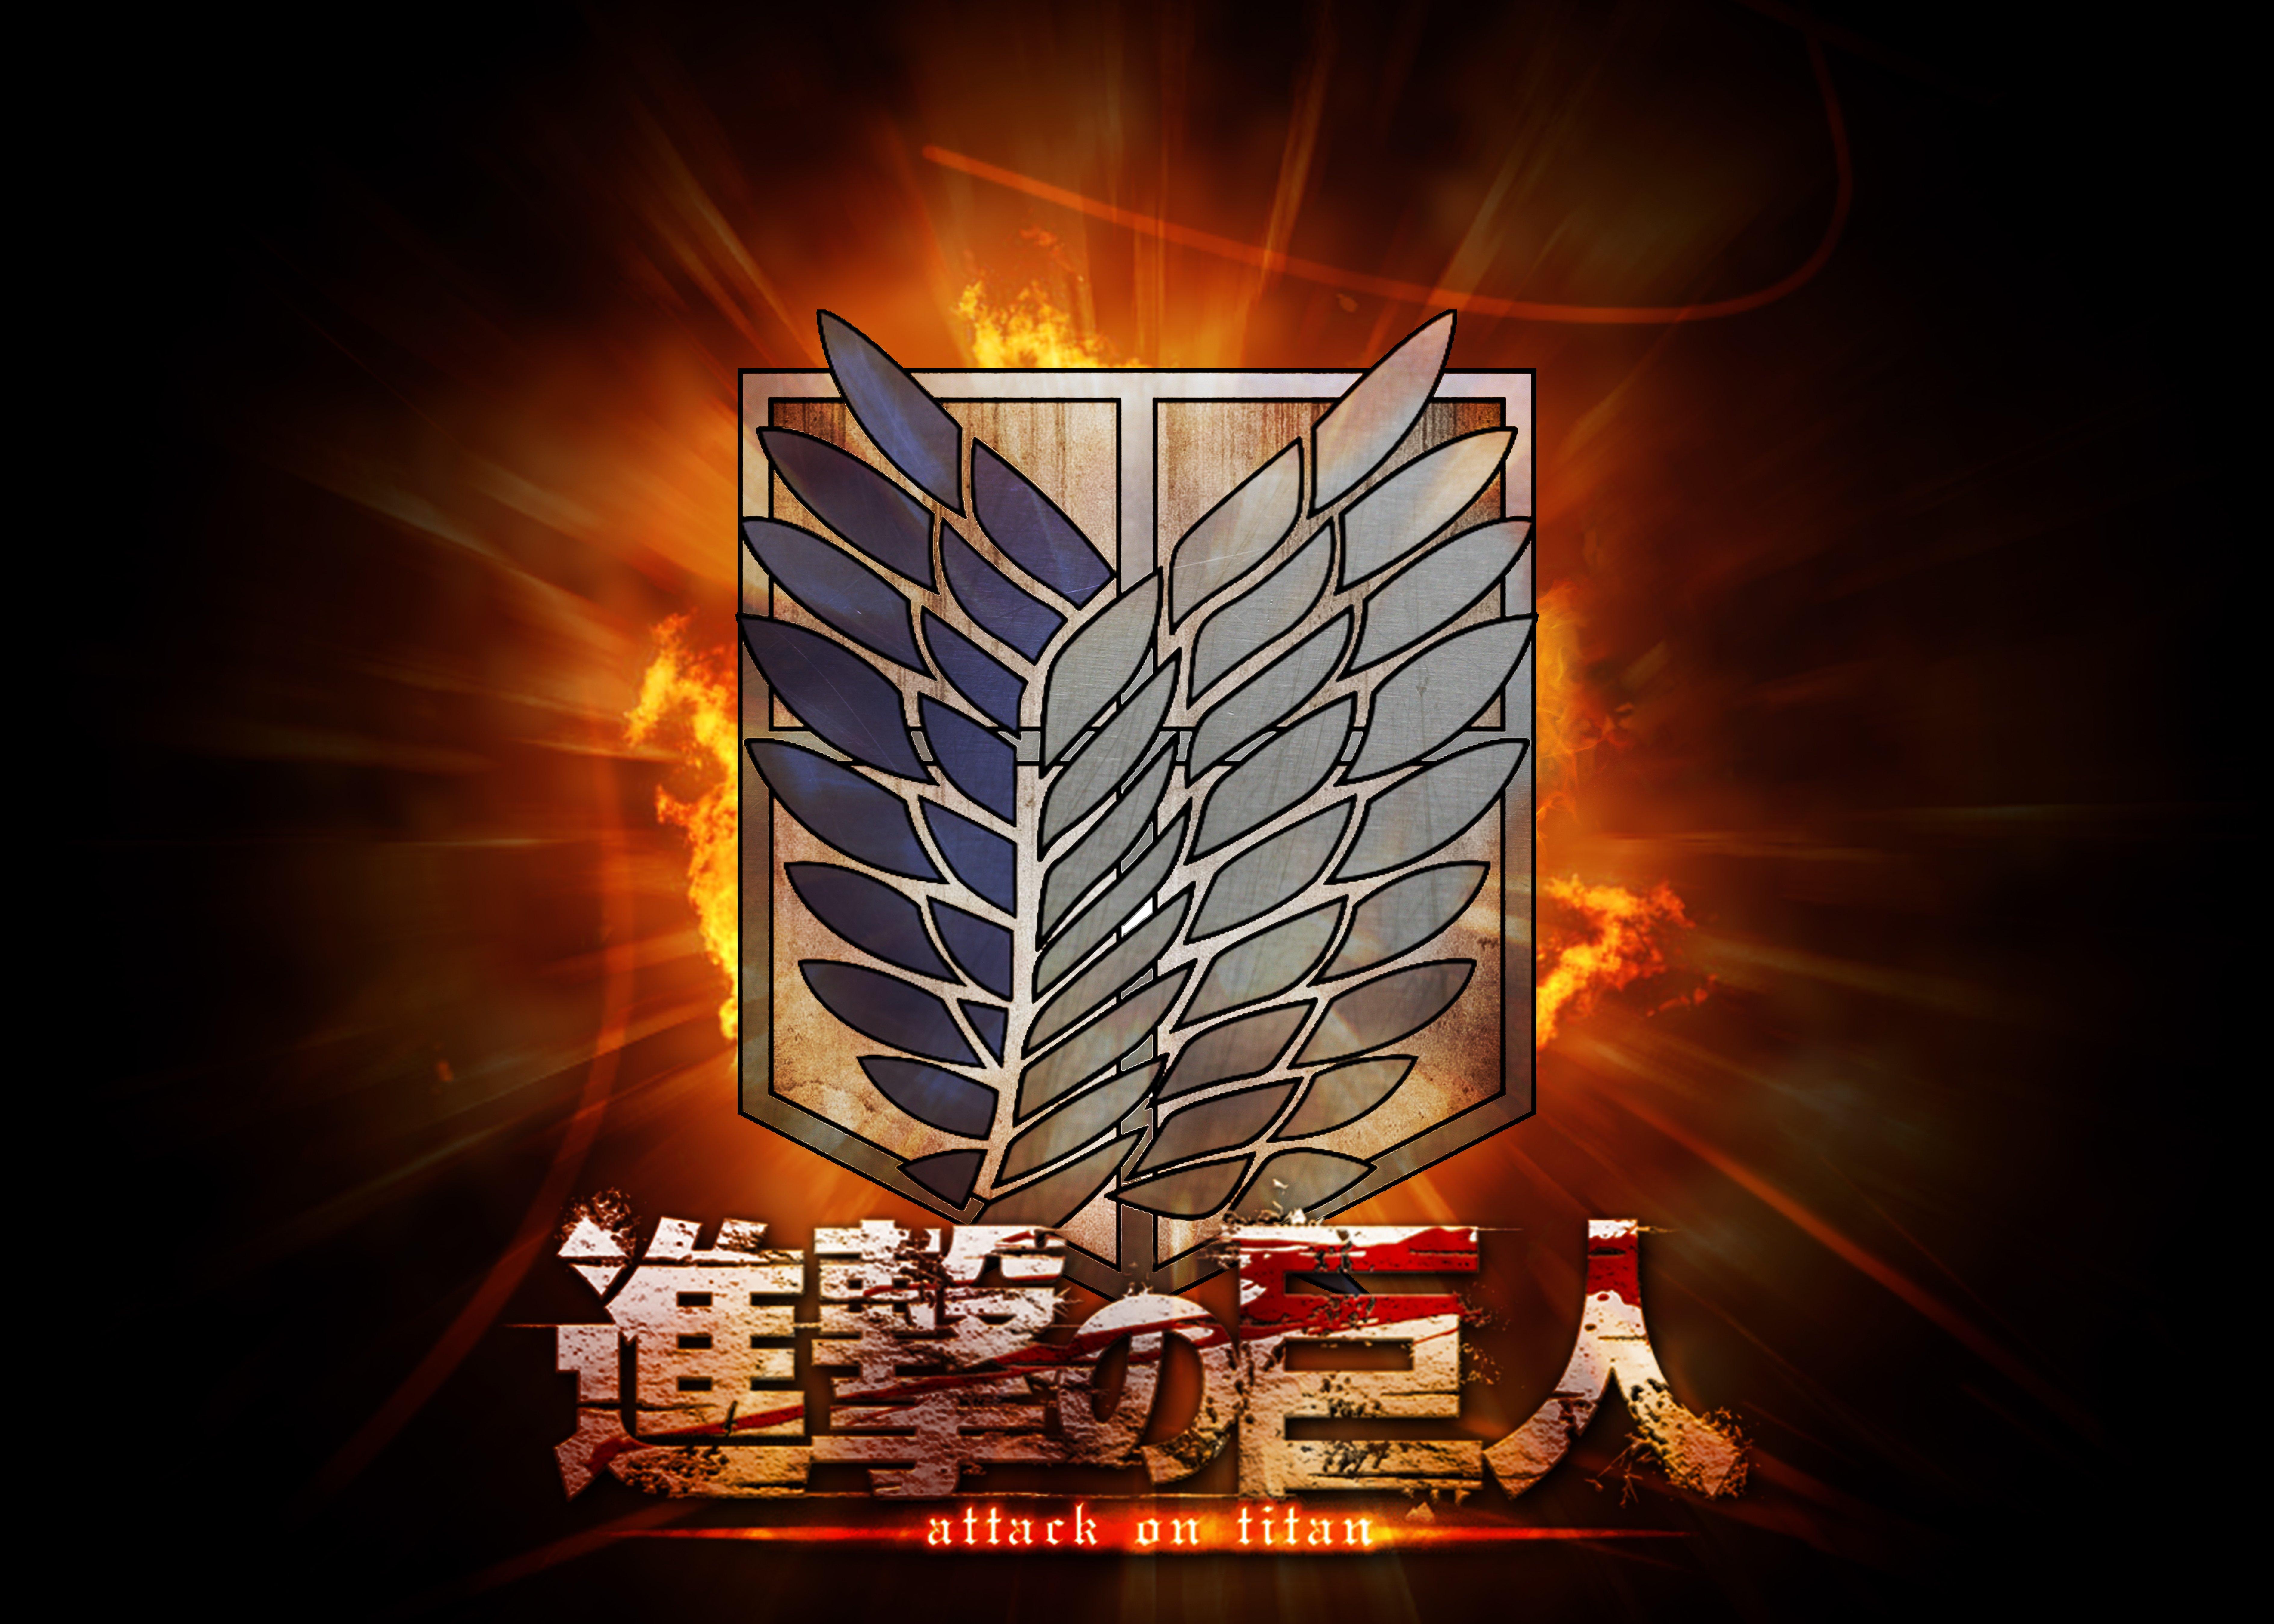 Attack on Titan Wallpaper 1366x768 Attack on Titan Wallpaper by 7560x5400